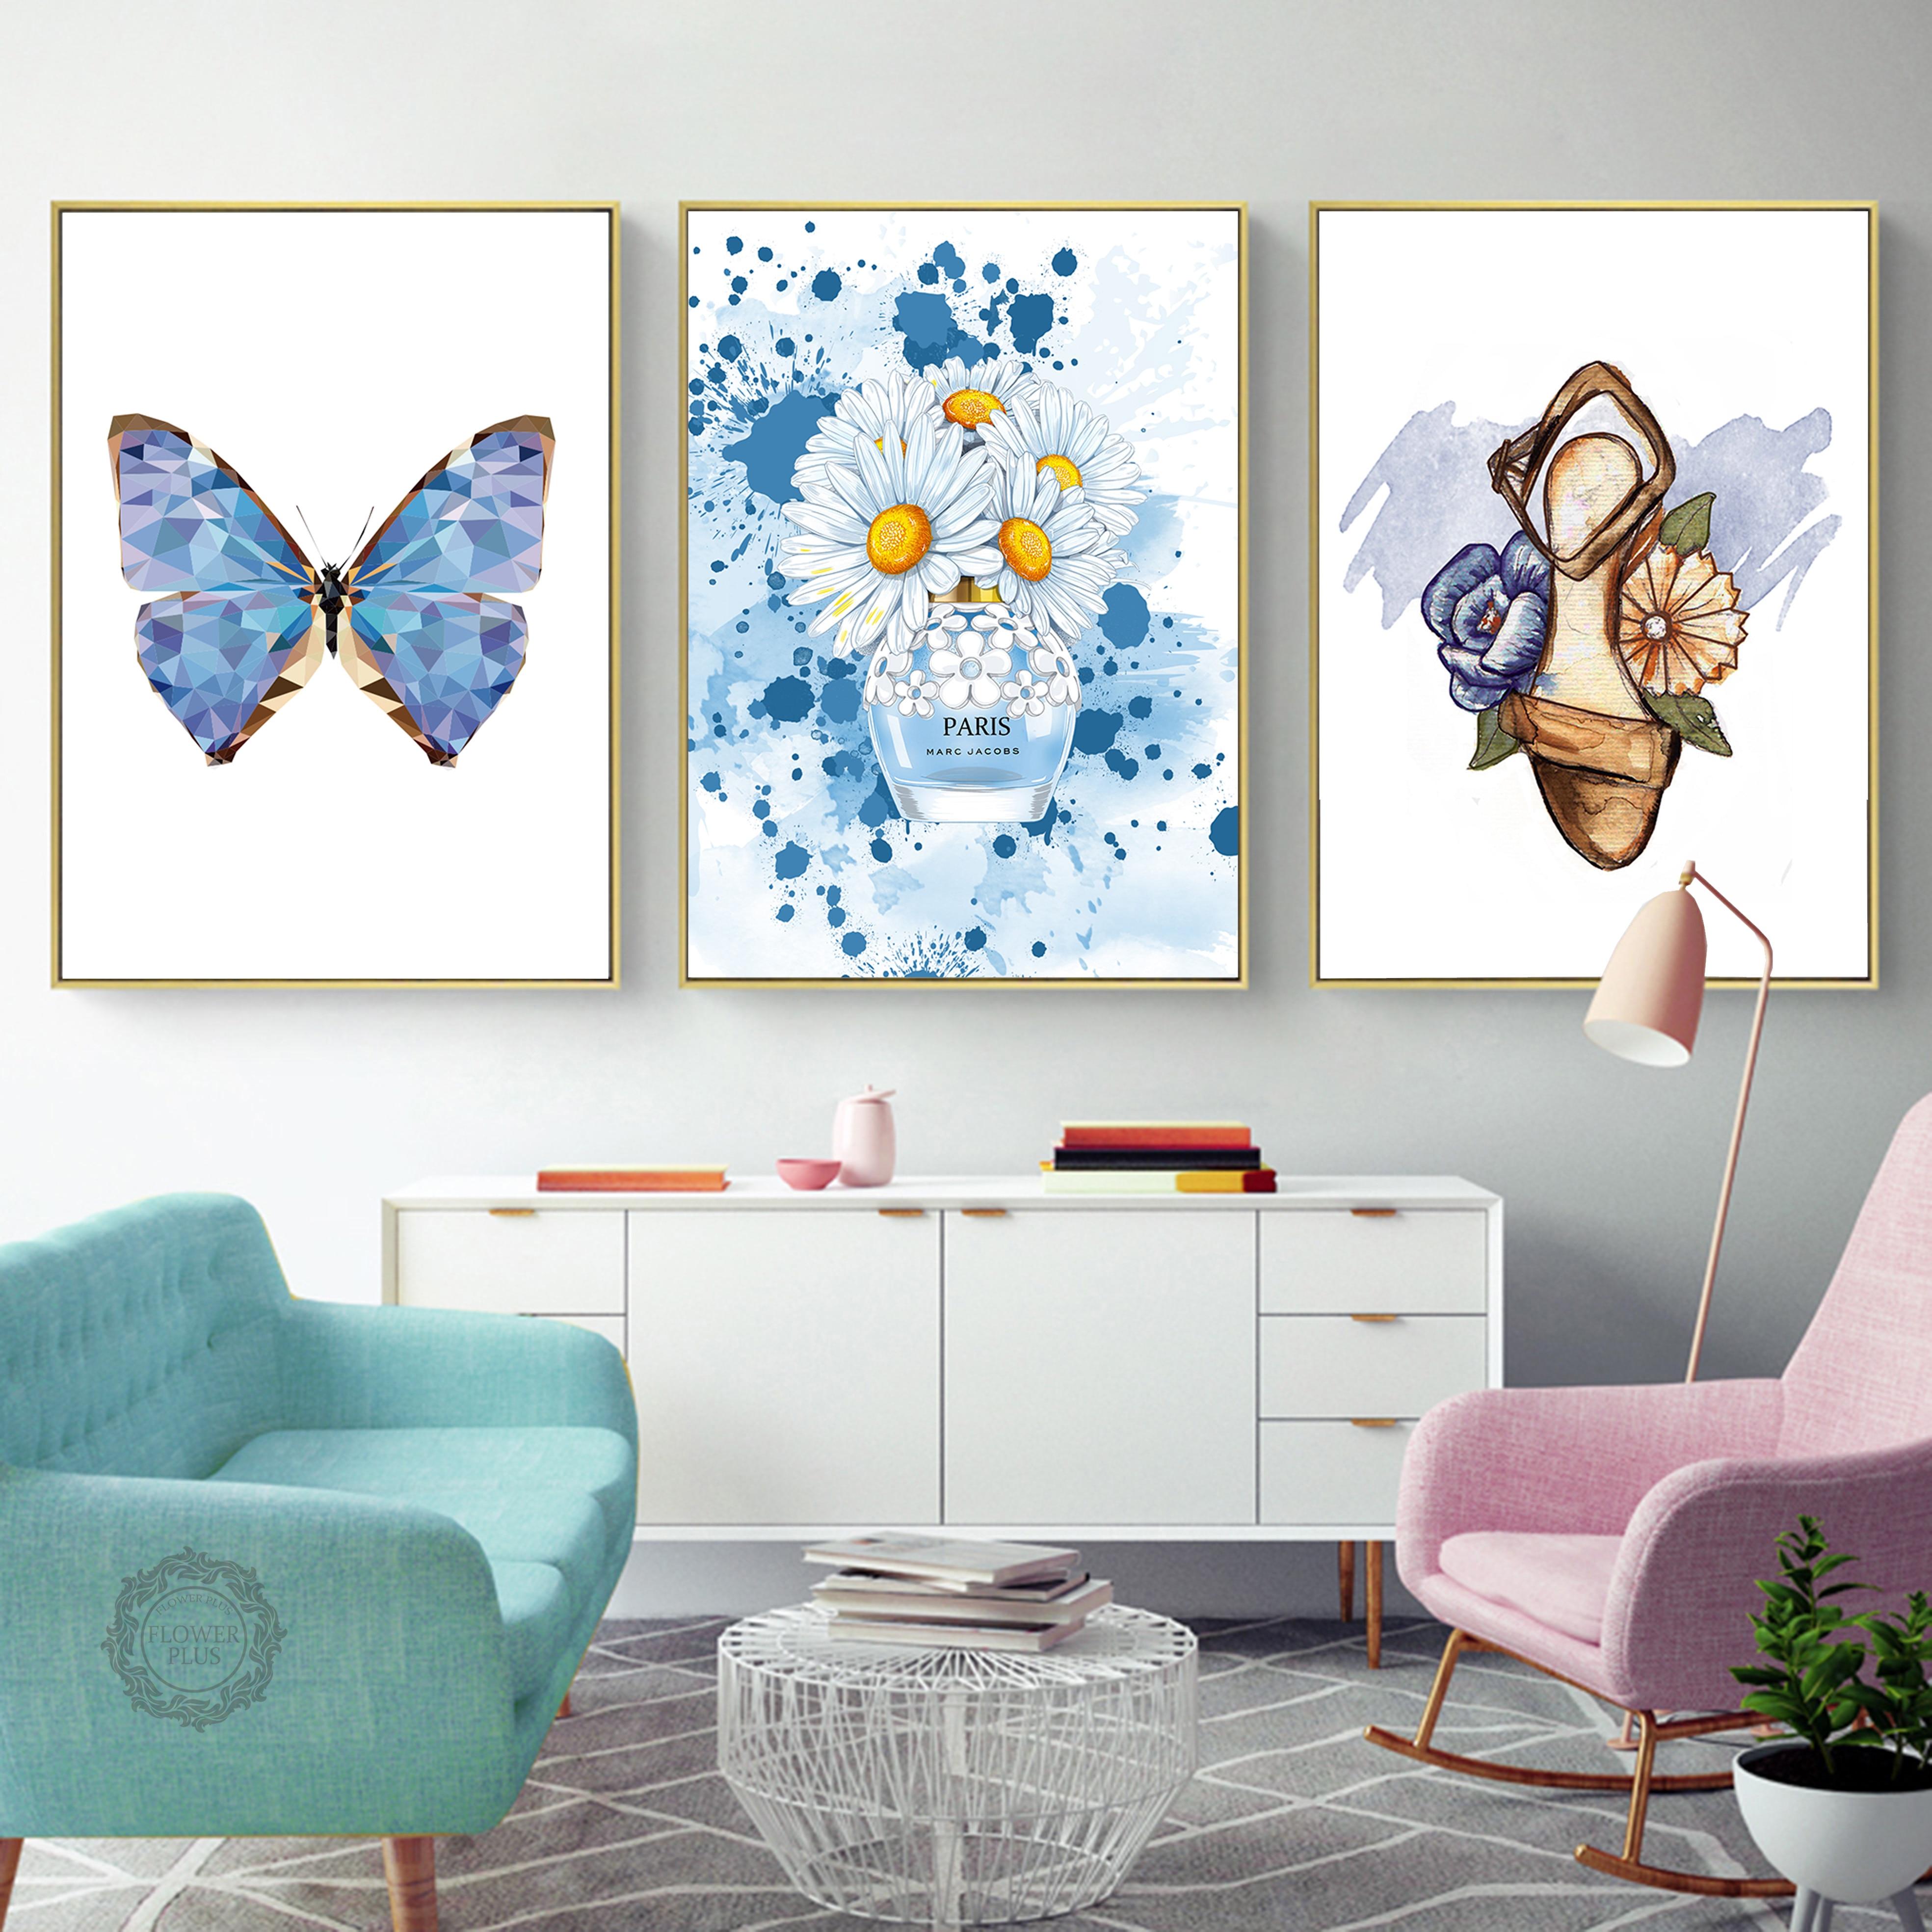 Classic Shoes Watercolour Wall Art Print Poster Beauty Fashion Home Decor Gift